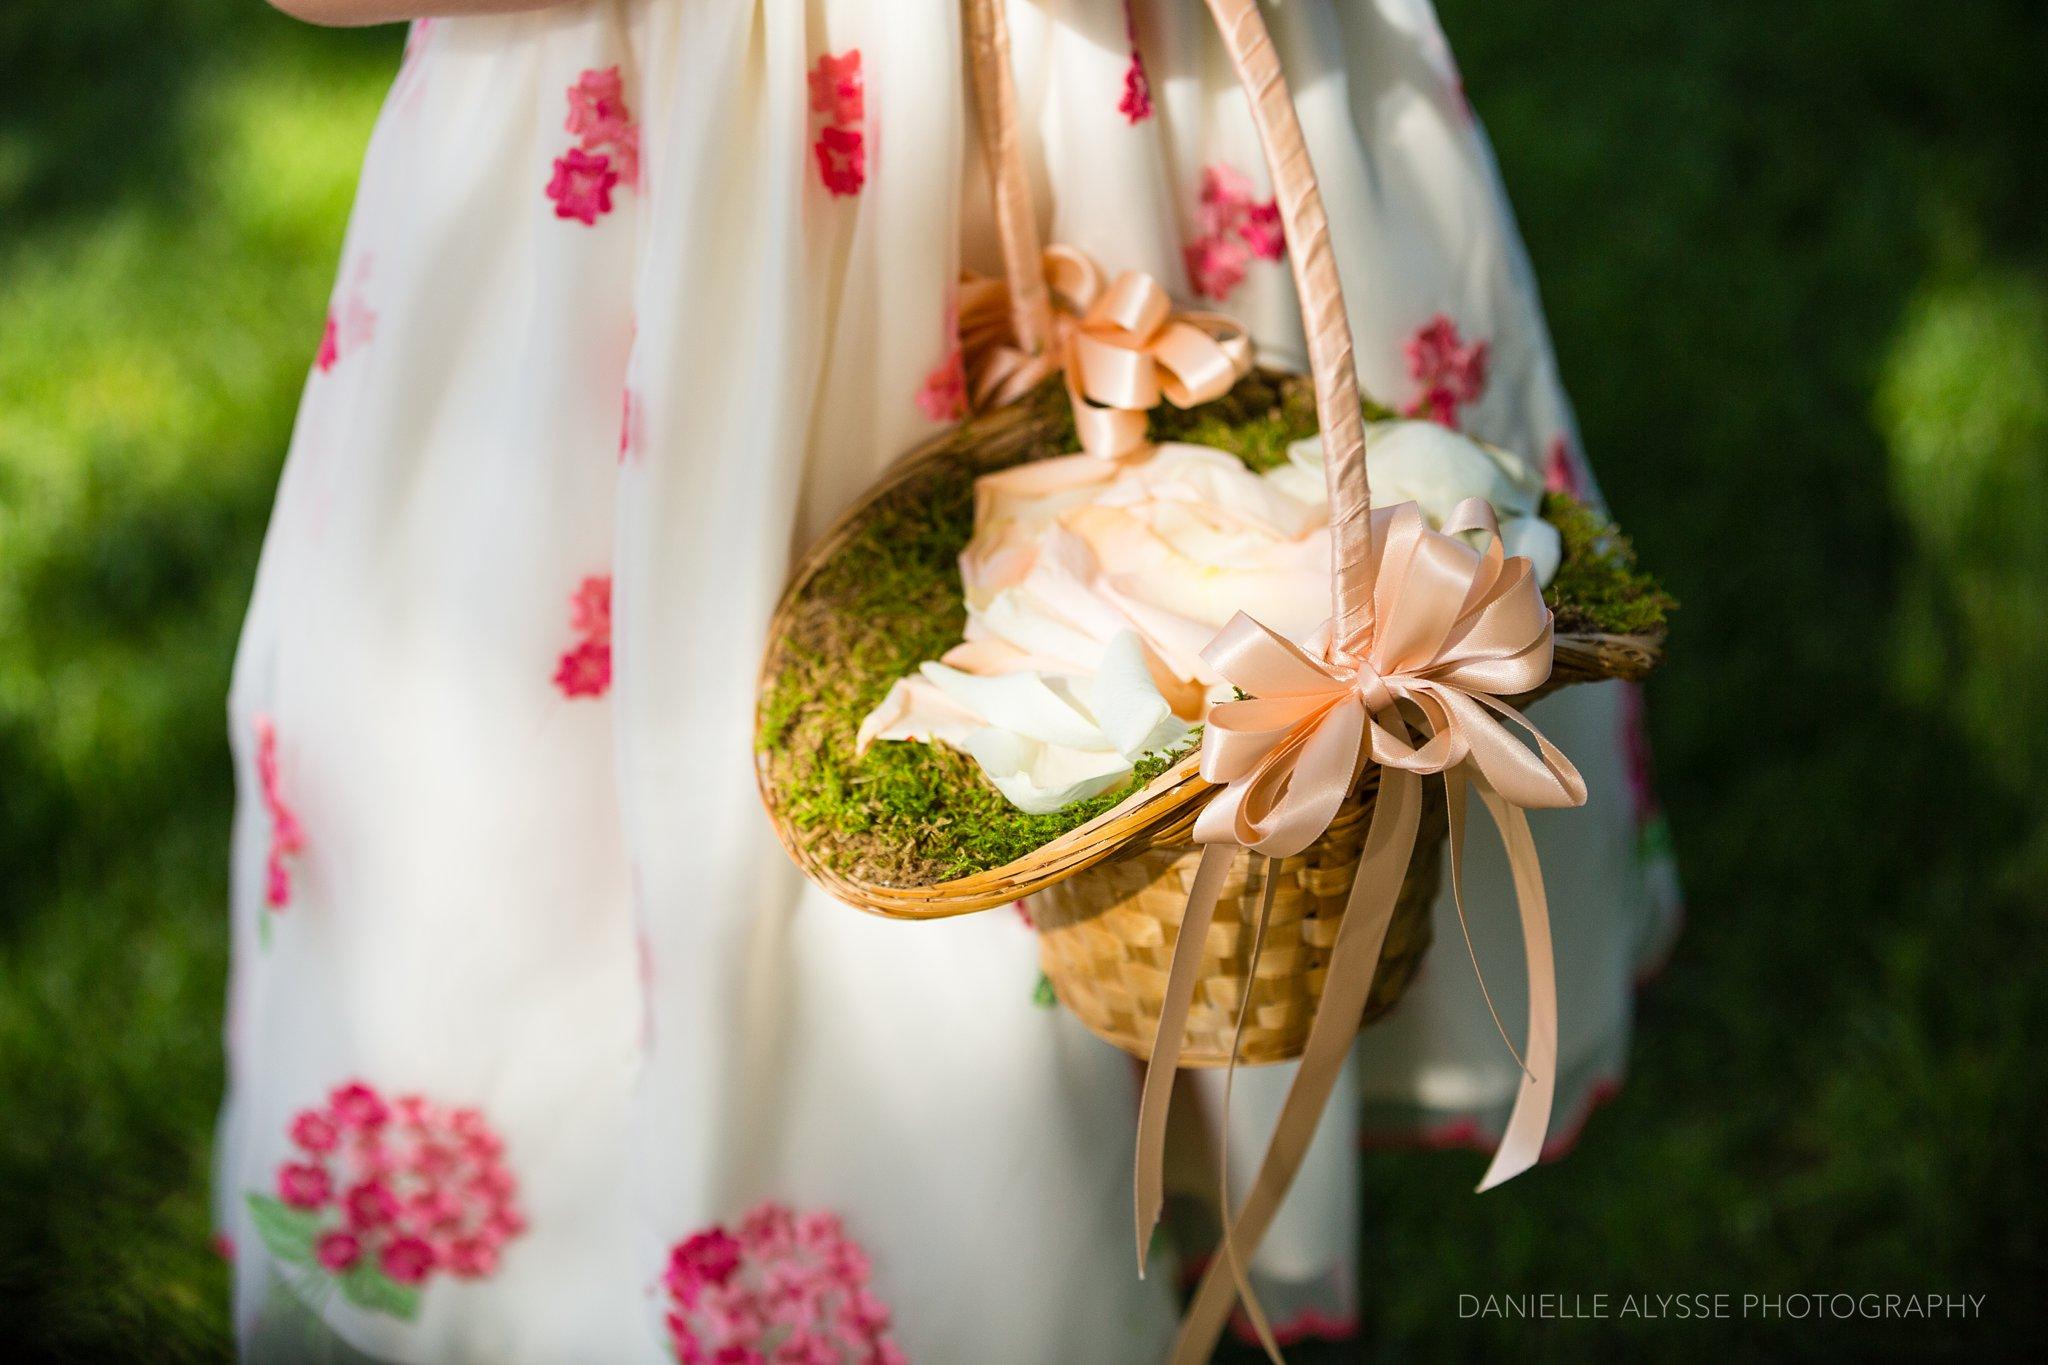 170507_blog_megan_david_wedding_loomis_flower_farm_inn_danielle_alysse_photography_sacramento_photographer0134_WEB.jpg